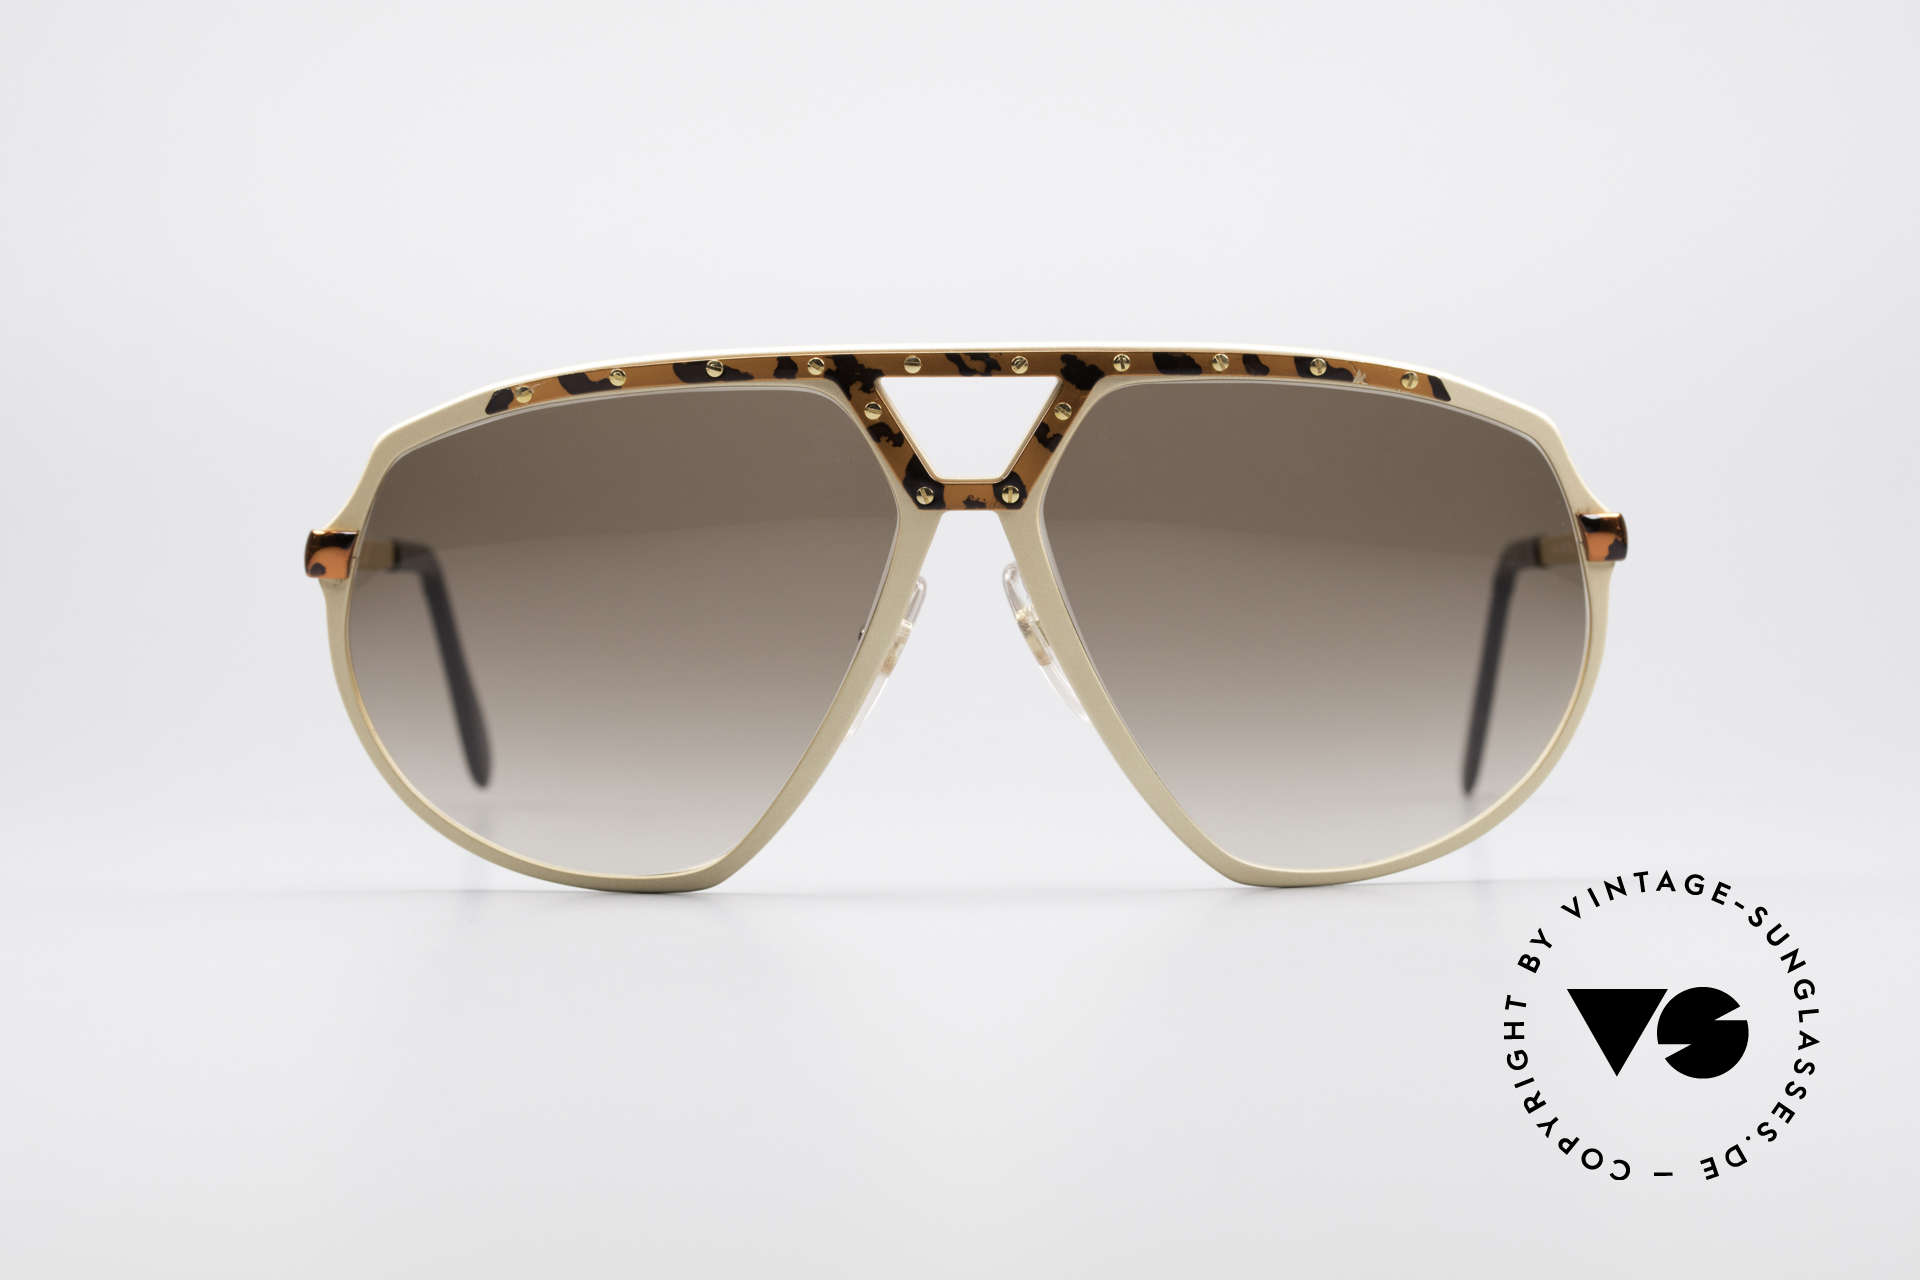 3a9415b429 Sunglasses Alpina M1 8 80 s West Germany Frame